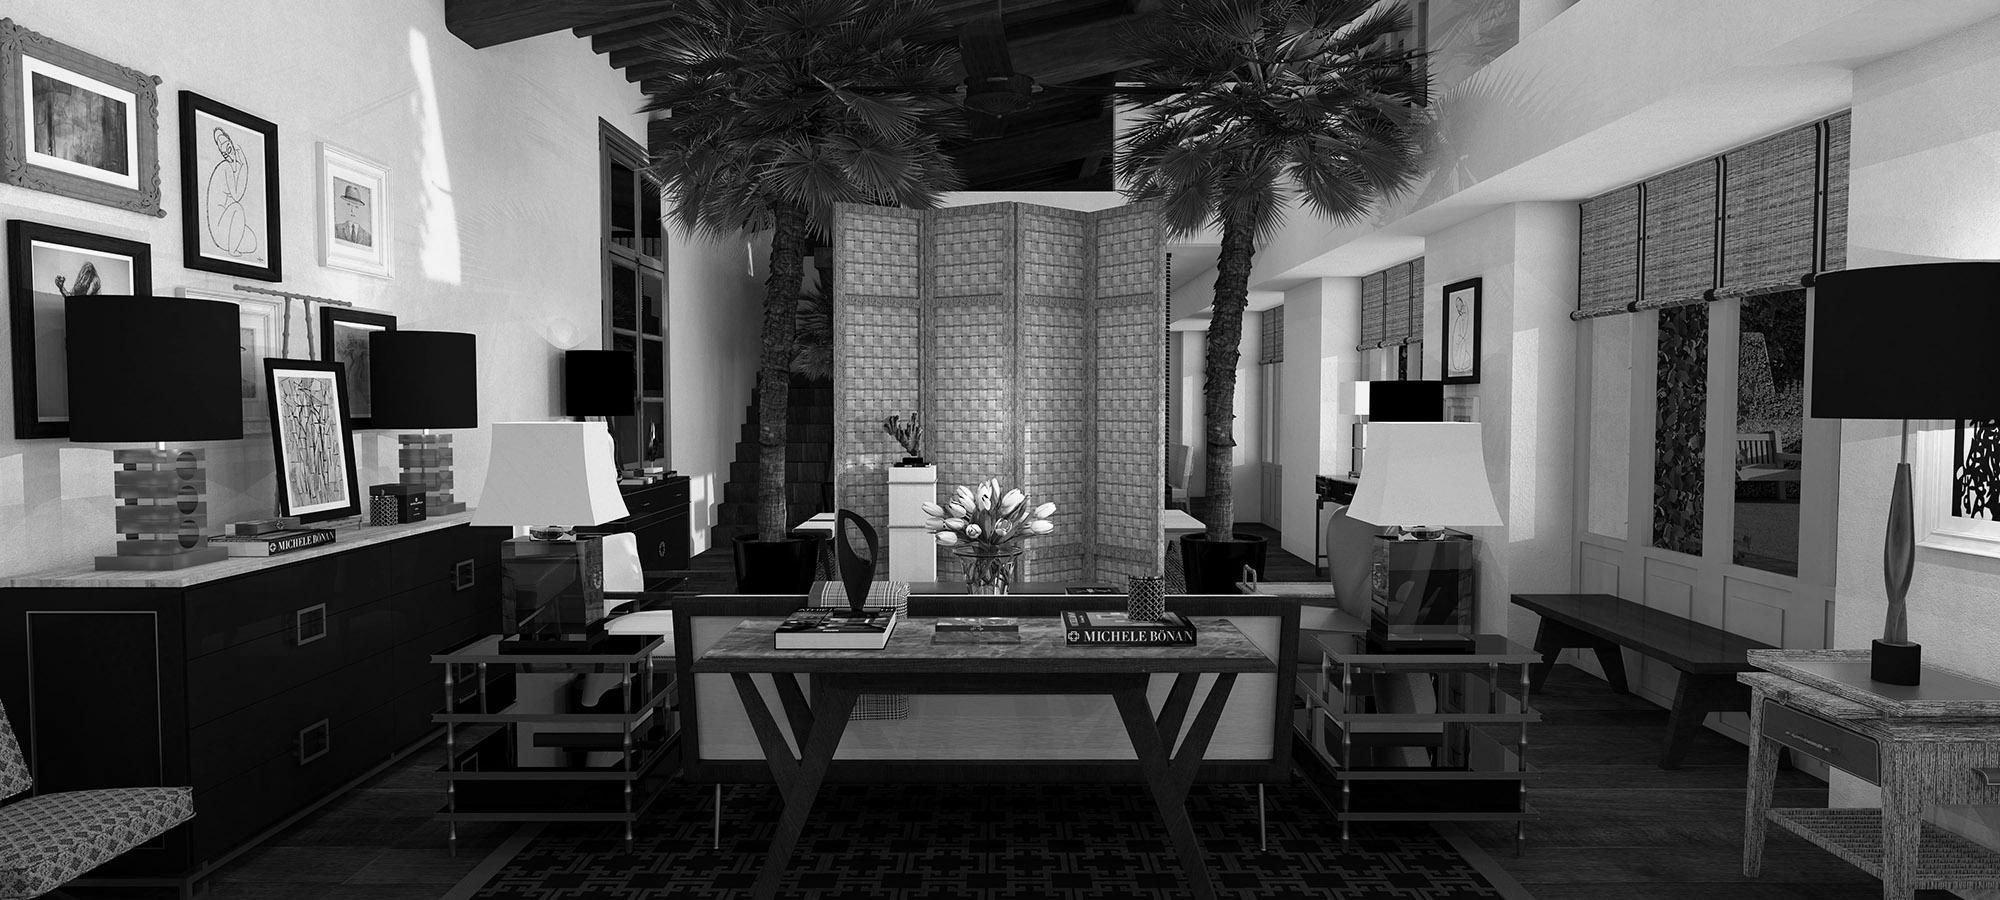 michele-bonan-interiors-showroom-3-bw-1